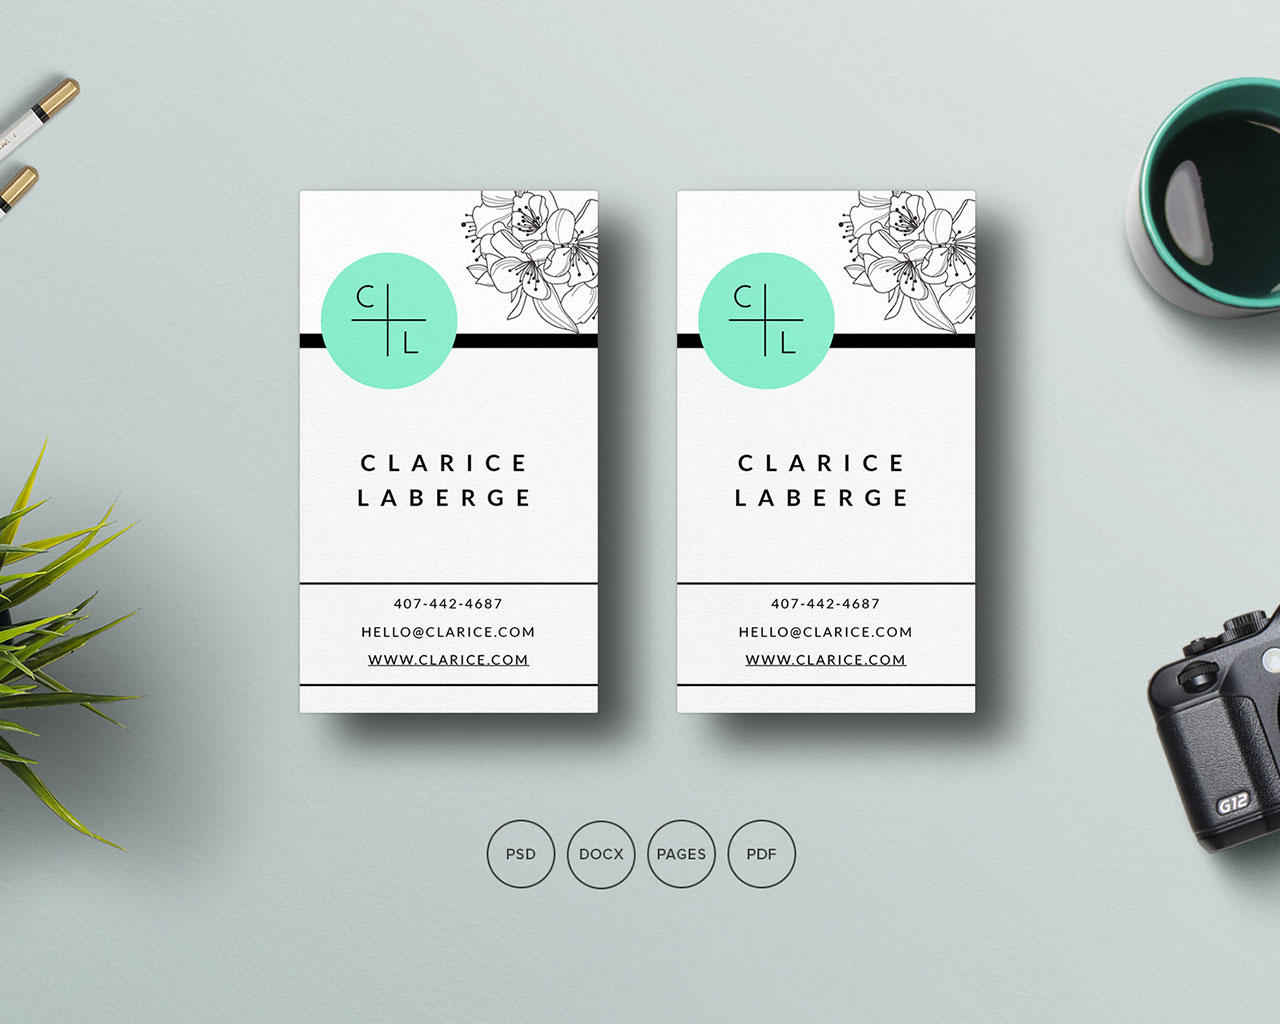 business card customization by coralixthemes on envato studio